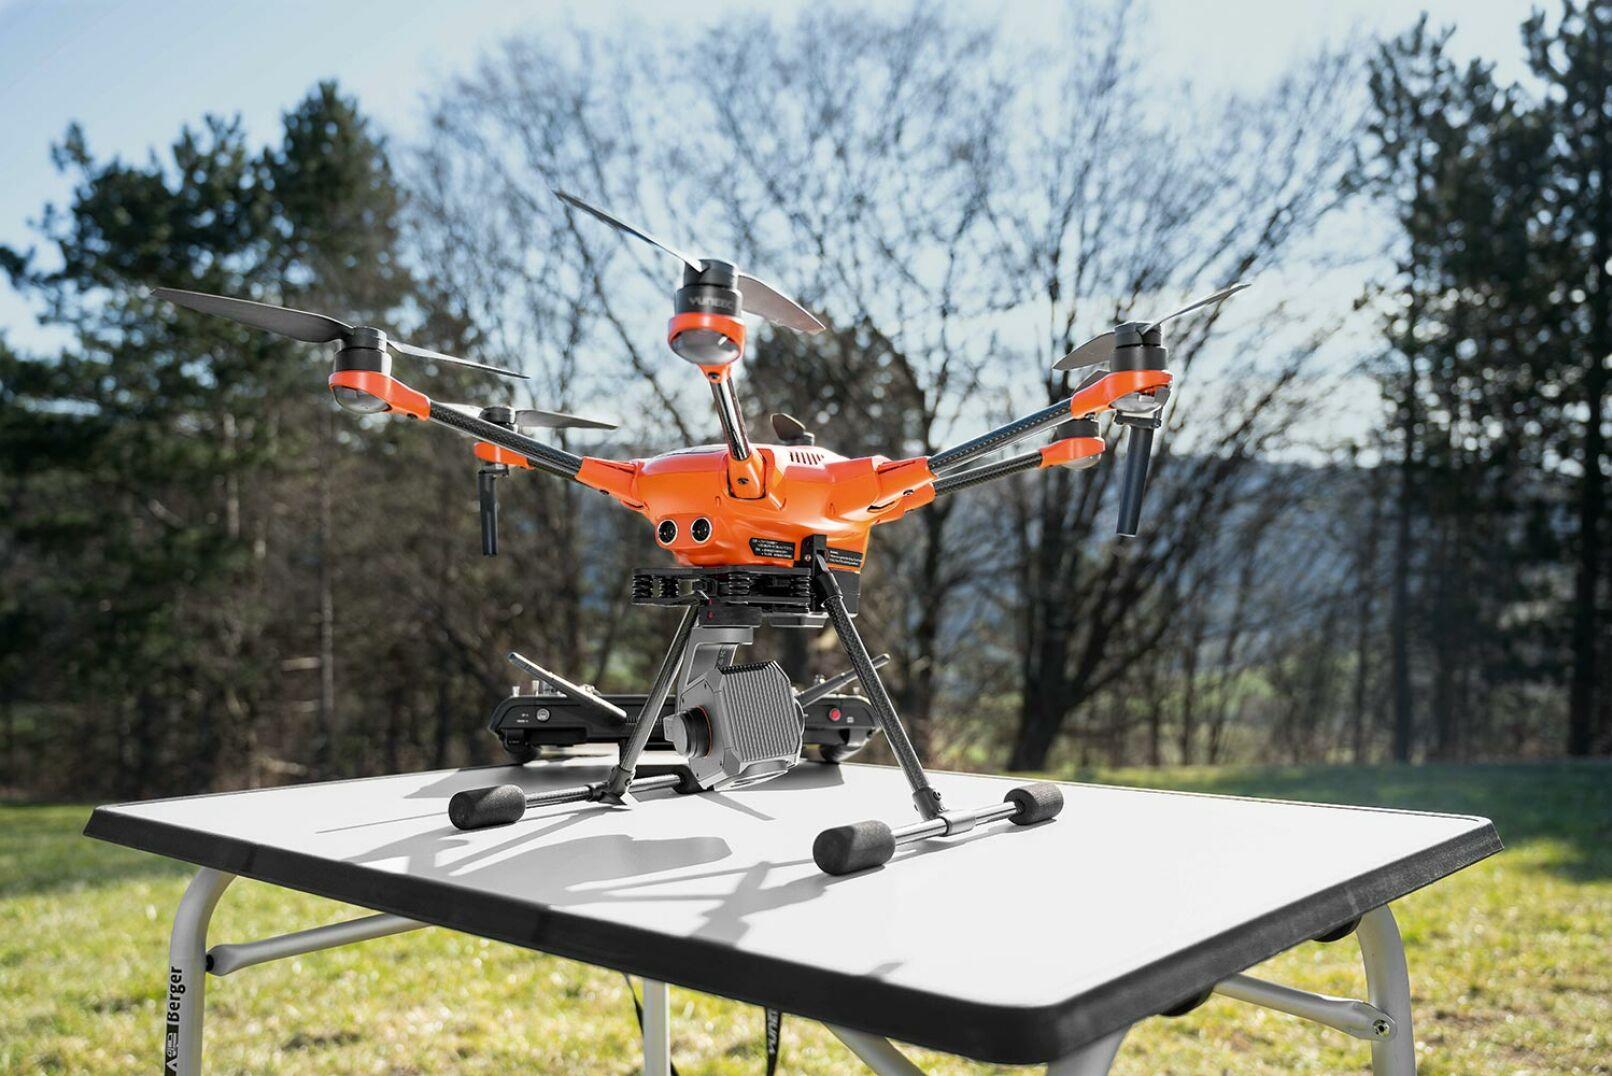 Hexacopter Yuneec H520E mit Wärmebildkamera Yuneec ETX (FLIR) - © Barbara Marko